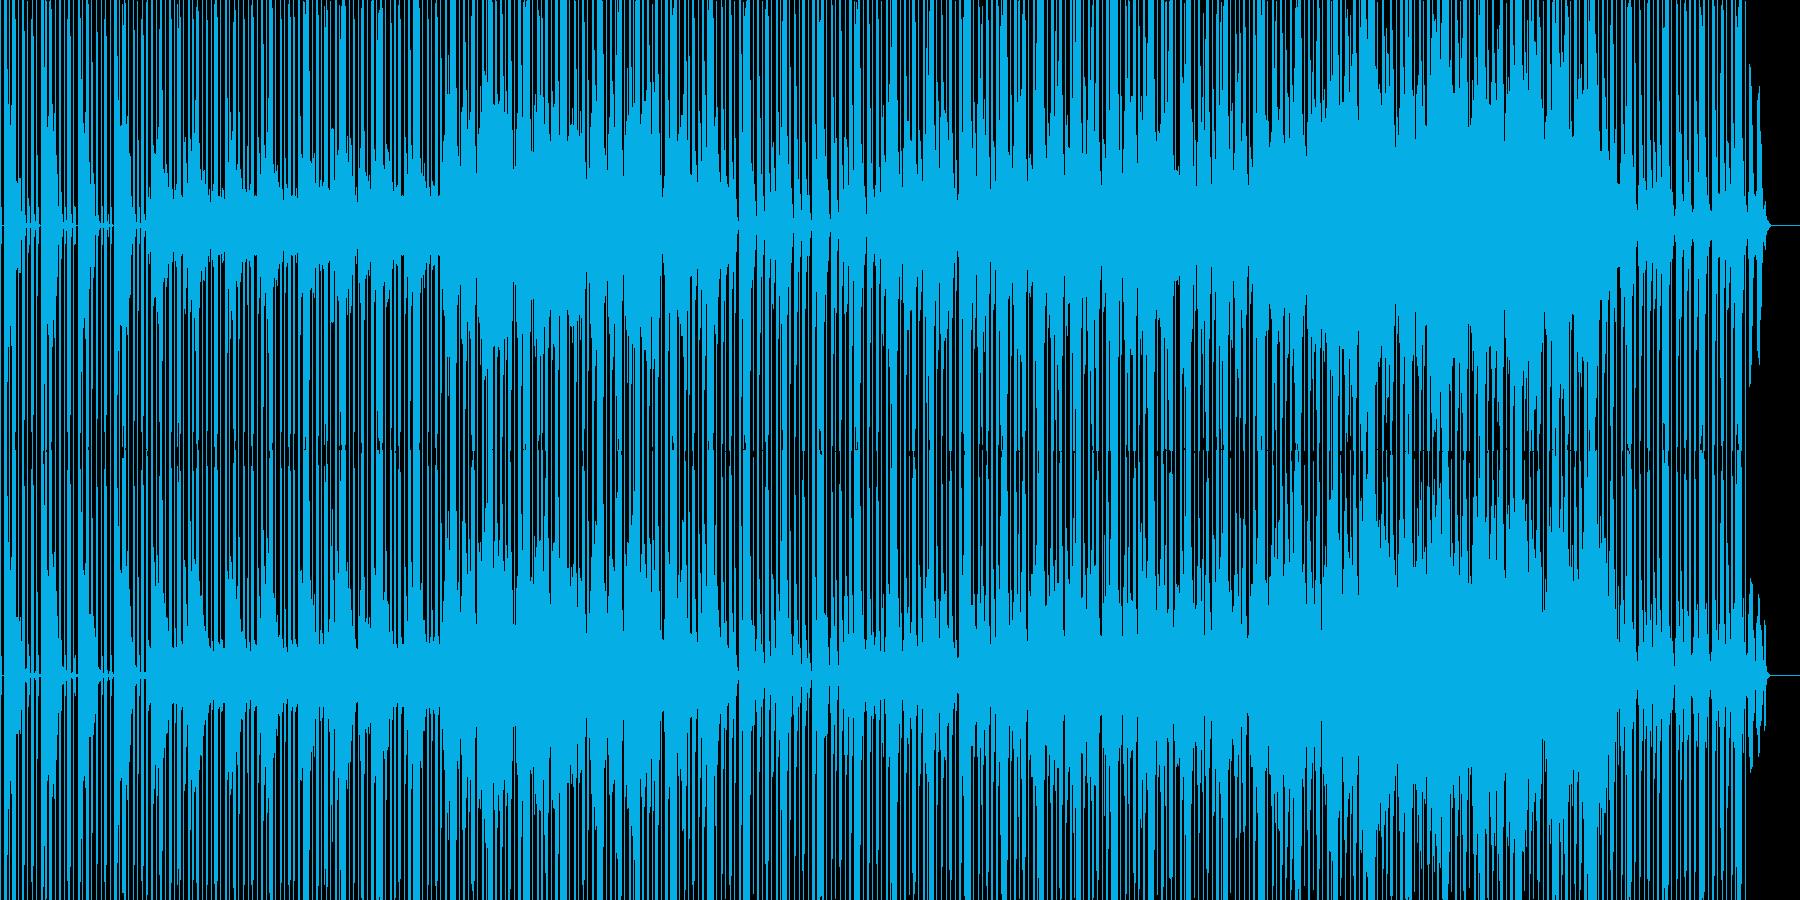 jazz/lo-fi/chillhopの再生済みの波形